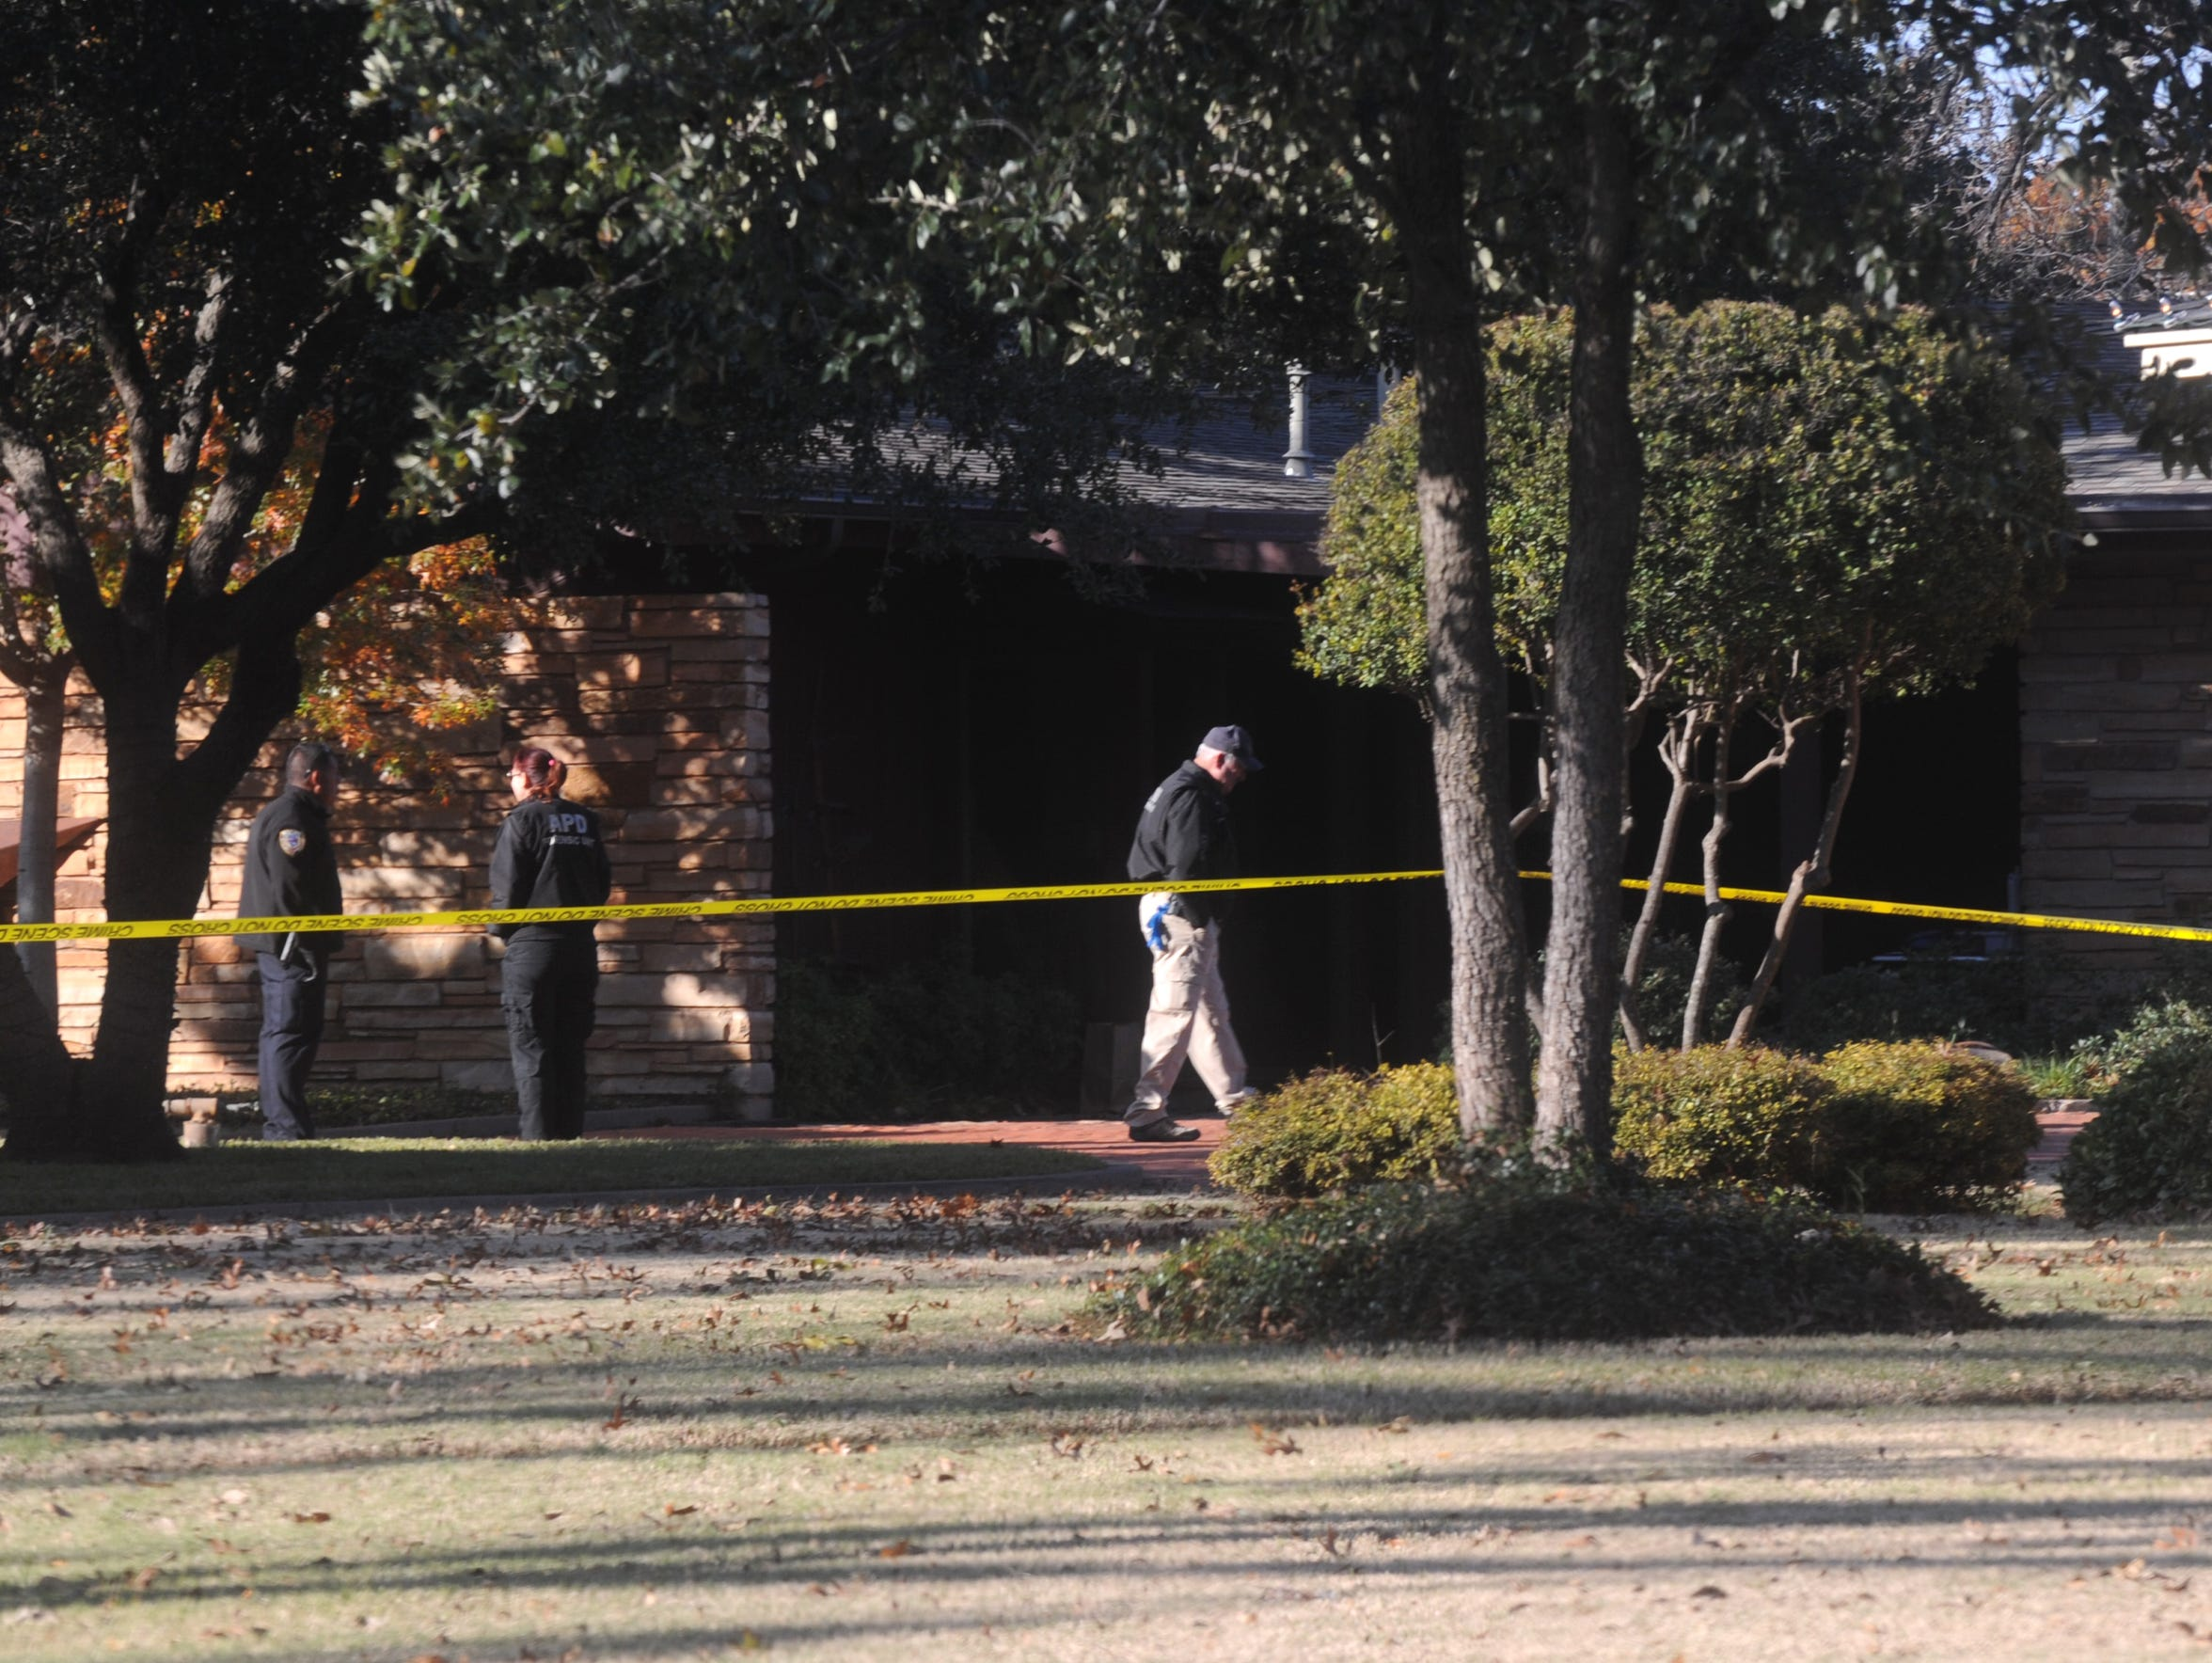 Abilene forensic unit officers prepare to investigate